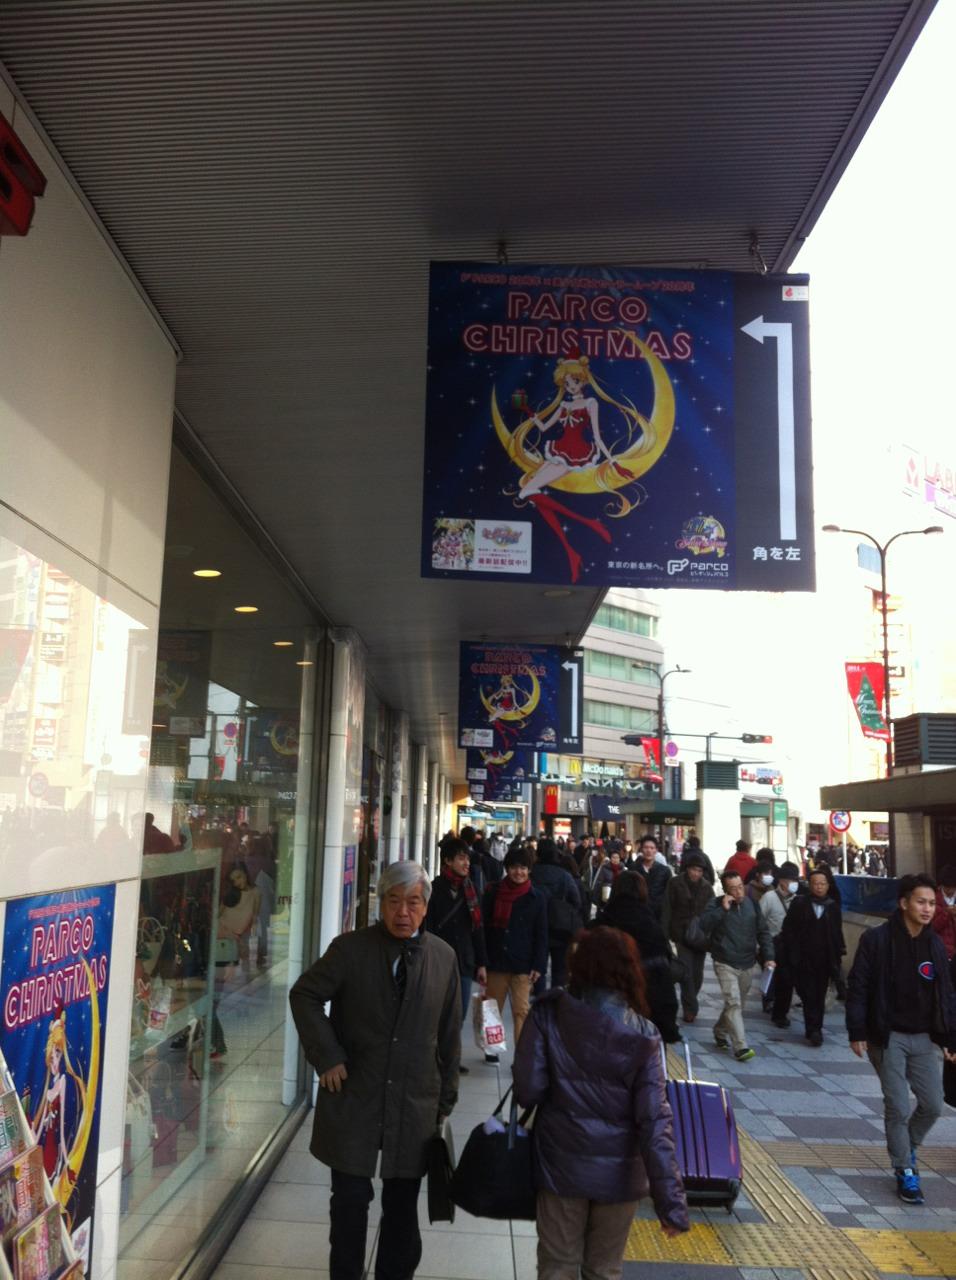 Santa Usagi Tsukino Sailor Moon Posters Spotted in Ikebukuro Town haruhichan.com Sailor Moon Crystal poster 2